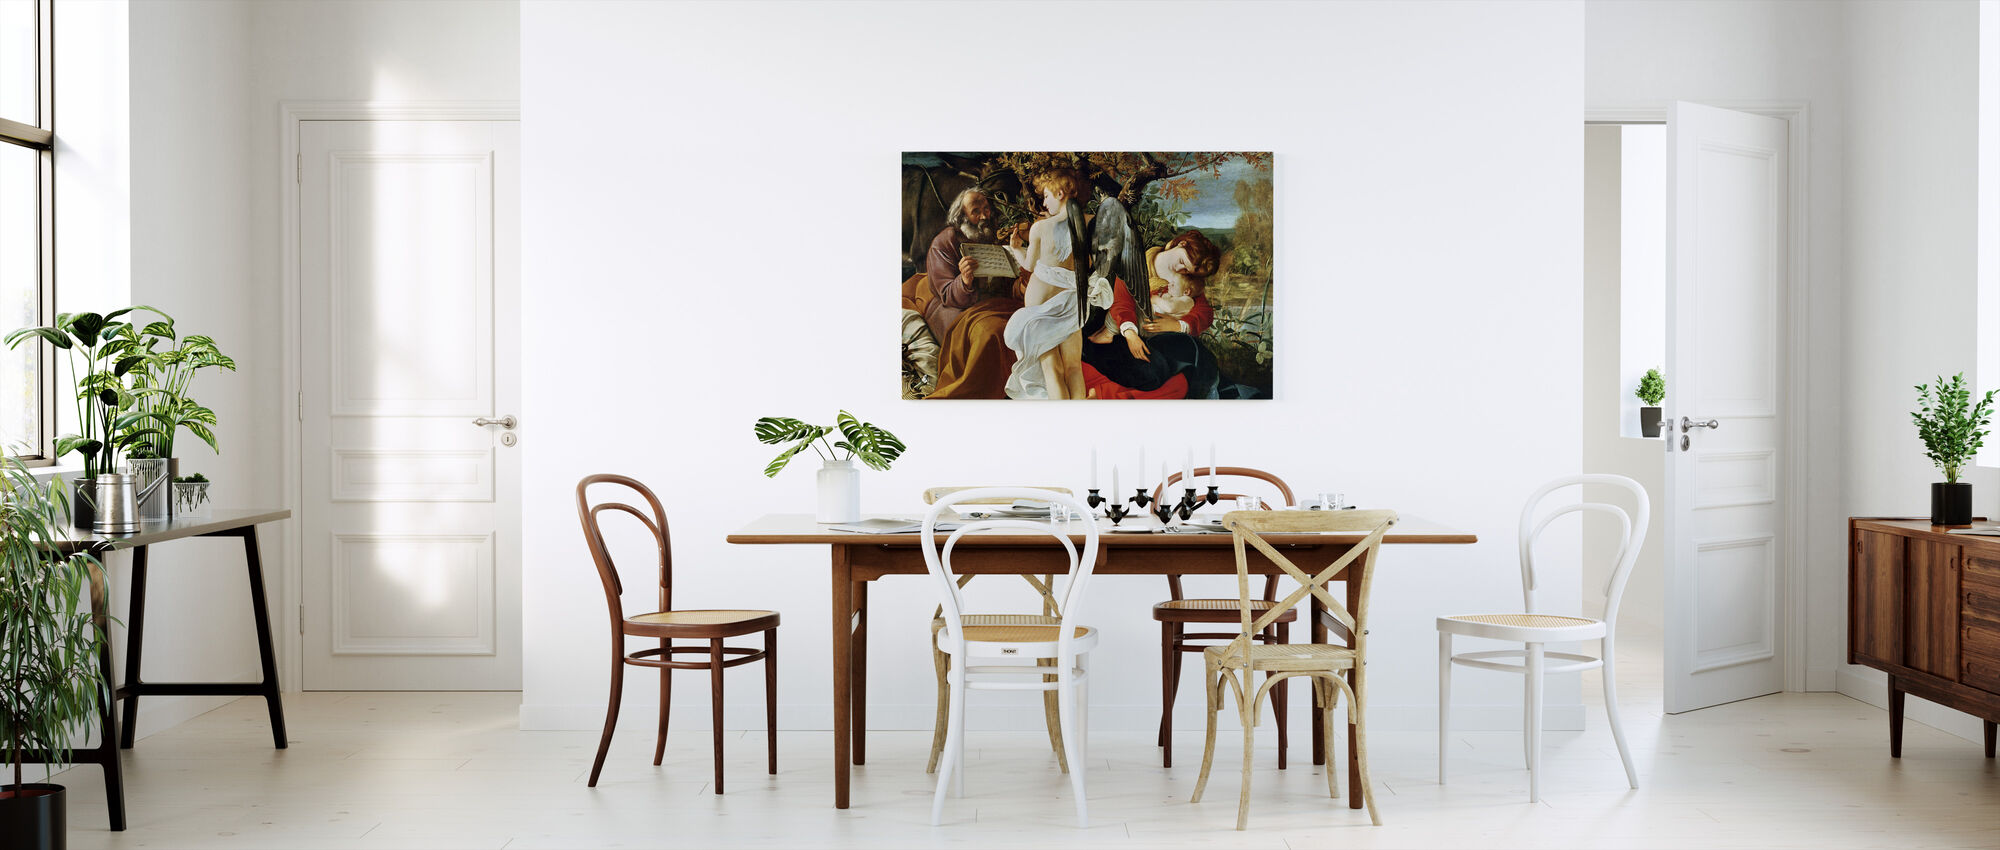 Rest on the Flight into Egypt - Michelangelo Merisi da Caravaggio - Canvas print - Kitchen